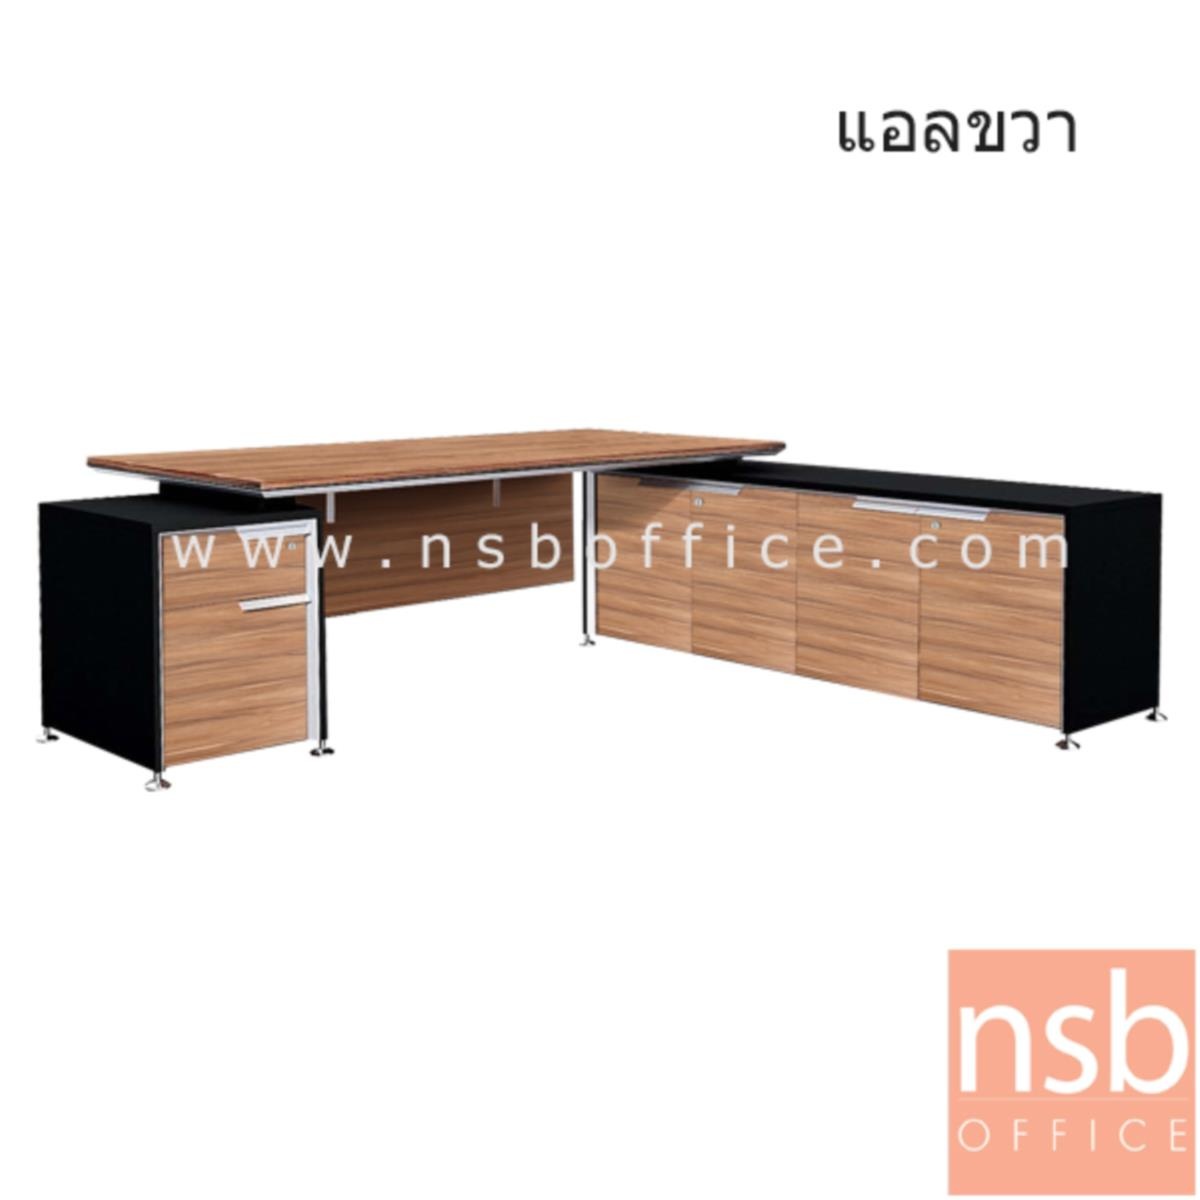 A33A013:โต๊ะผู้บริหารตัวแอล 2 ลิ้นชัก รุ่น Mystique (มิสทีค) ขนาด 225W cm.  พร้อมตู้ข้างลิ้นชัก สีวอลนัทตัดดำ